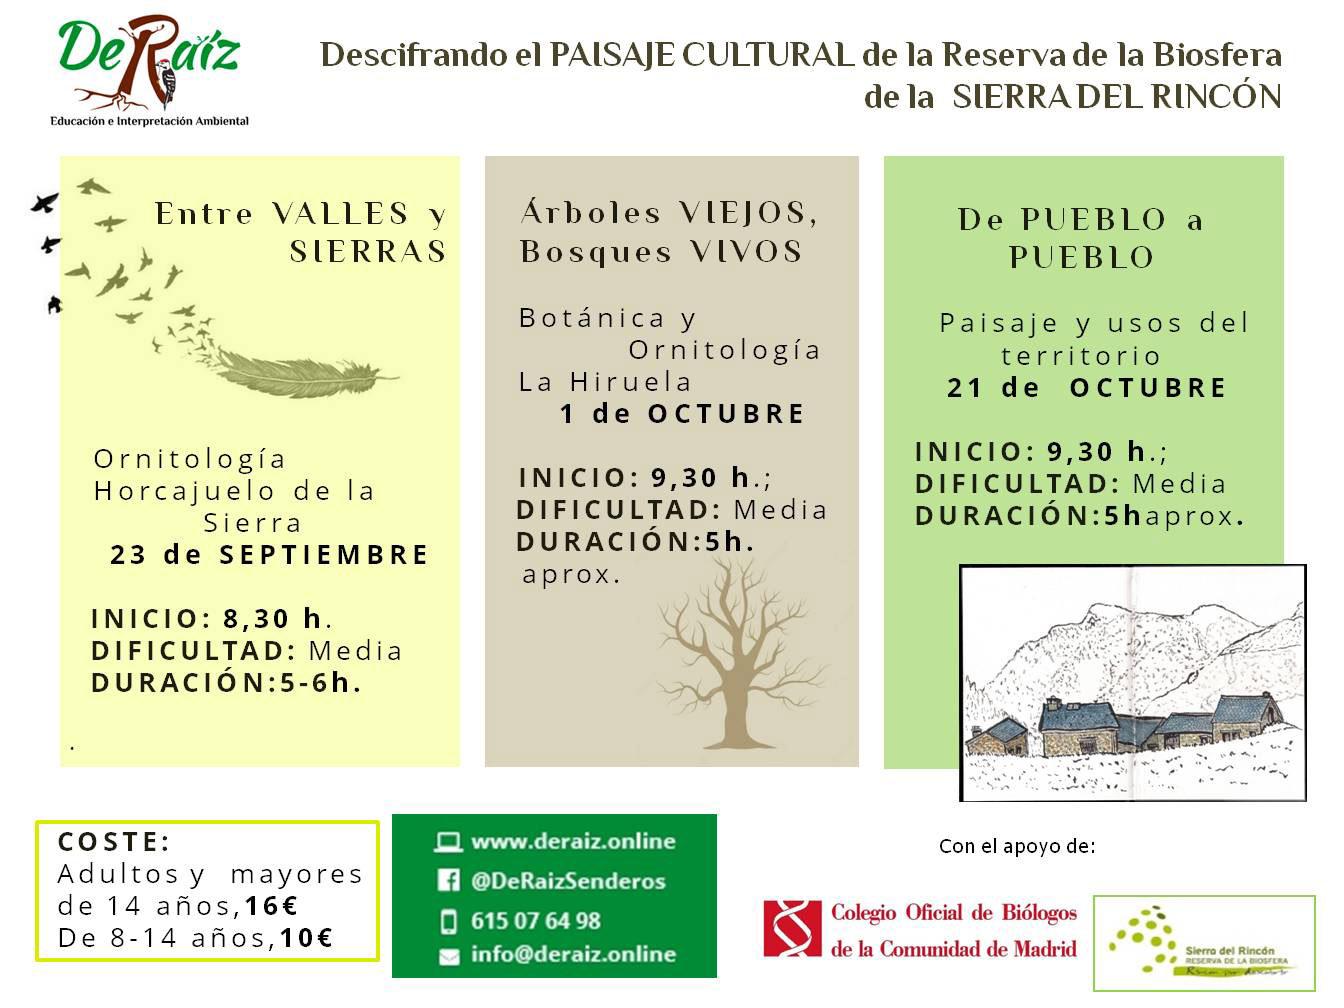 DeRaiz 2017oct-Sierra del Rincon